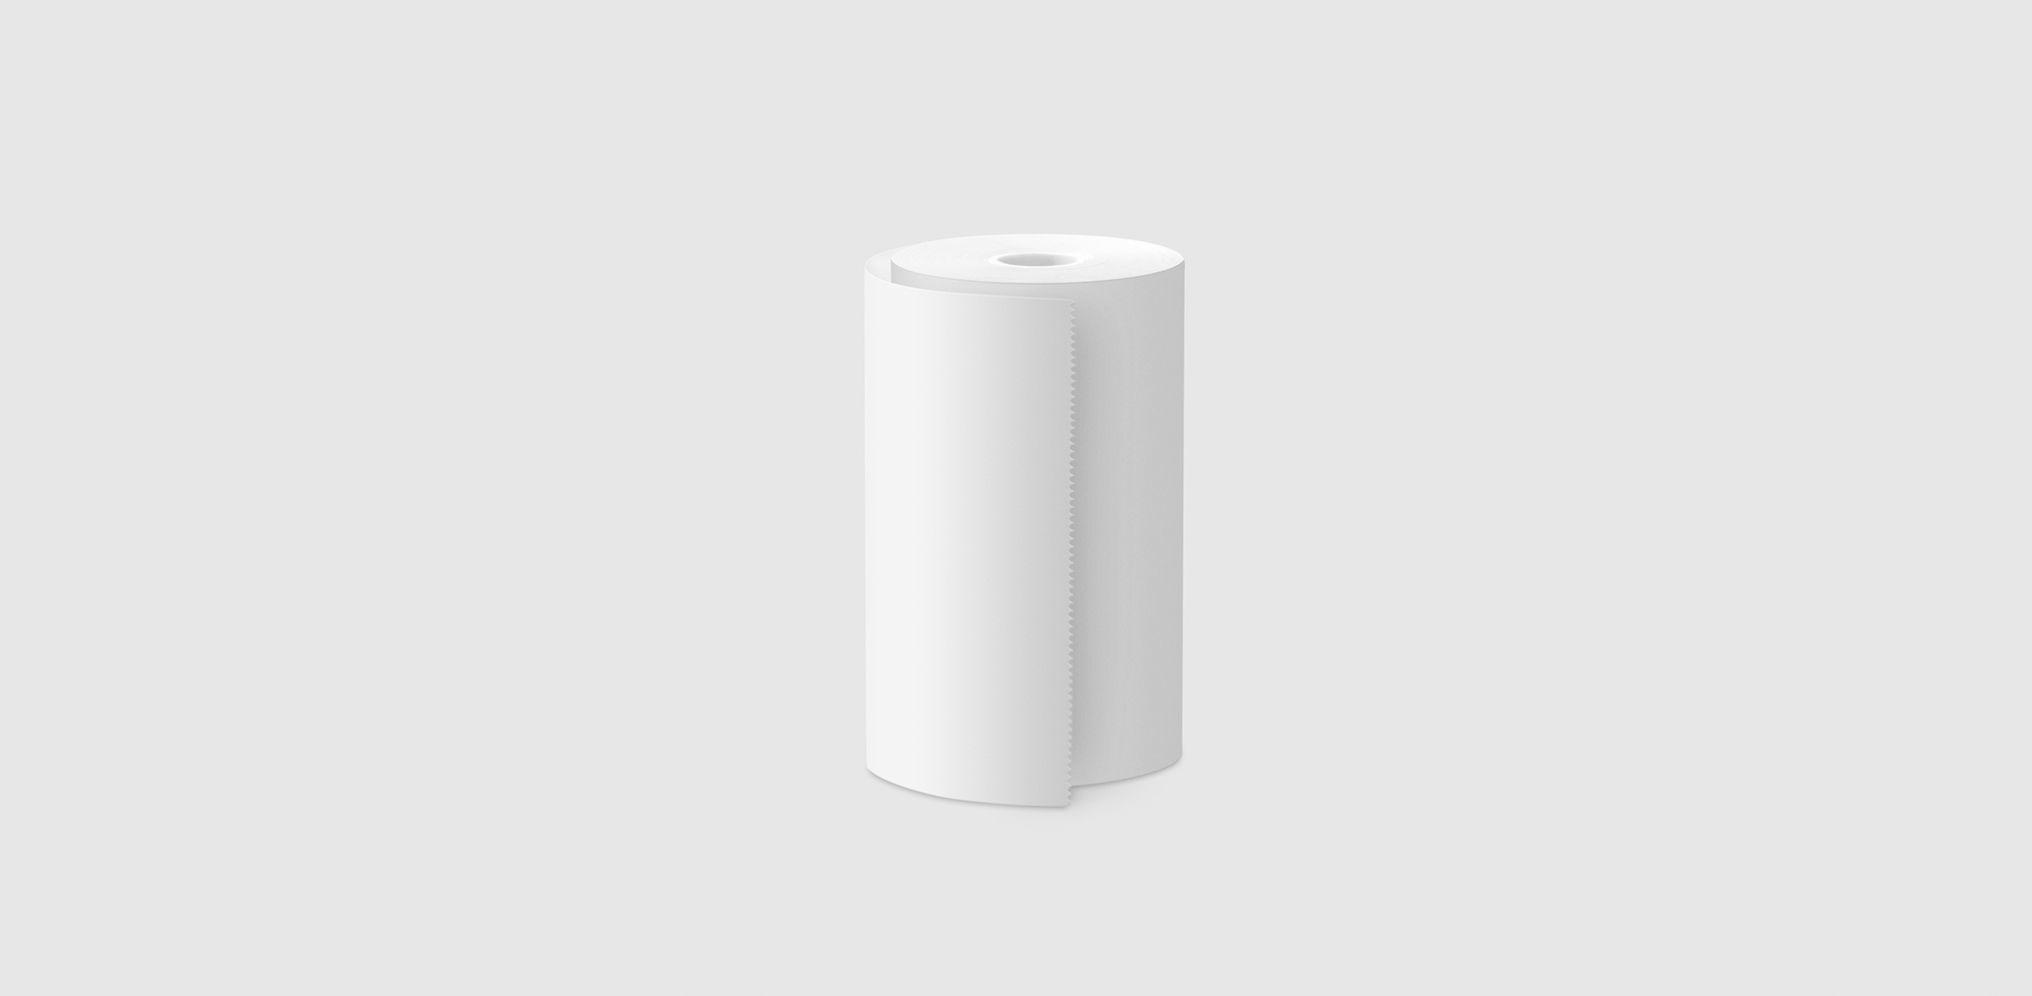 mPOP Receipt Printer Paper (12 rolls) | Square Shop